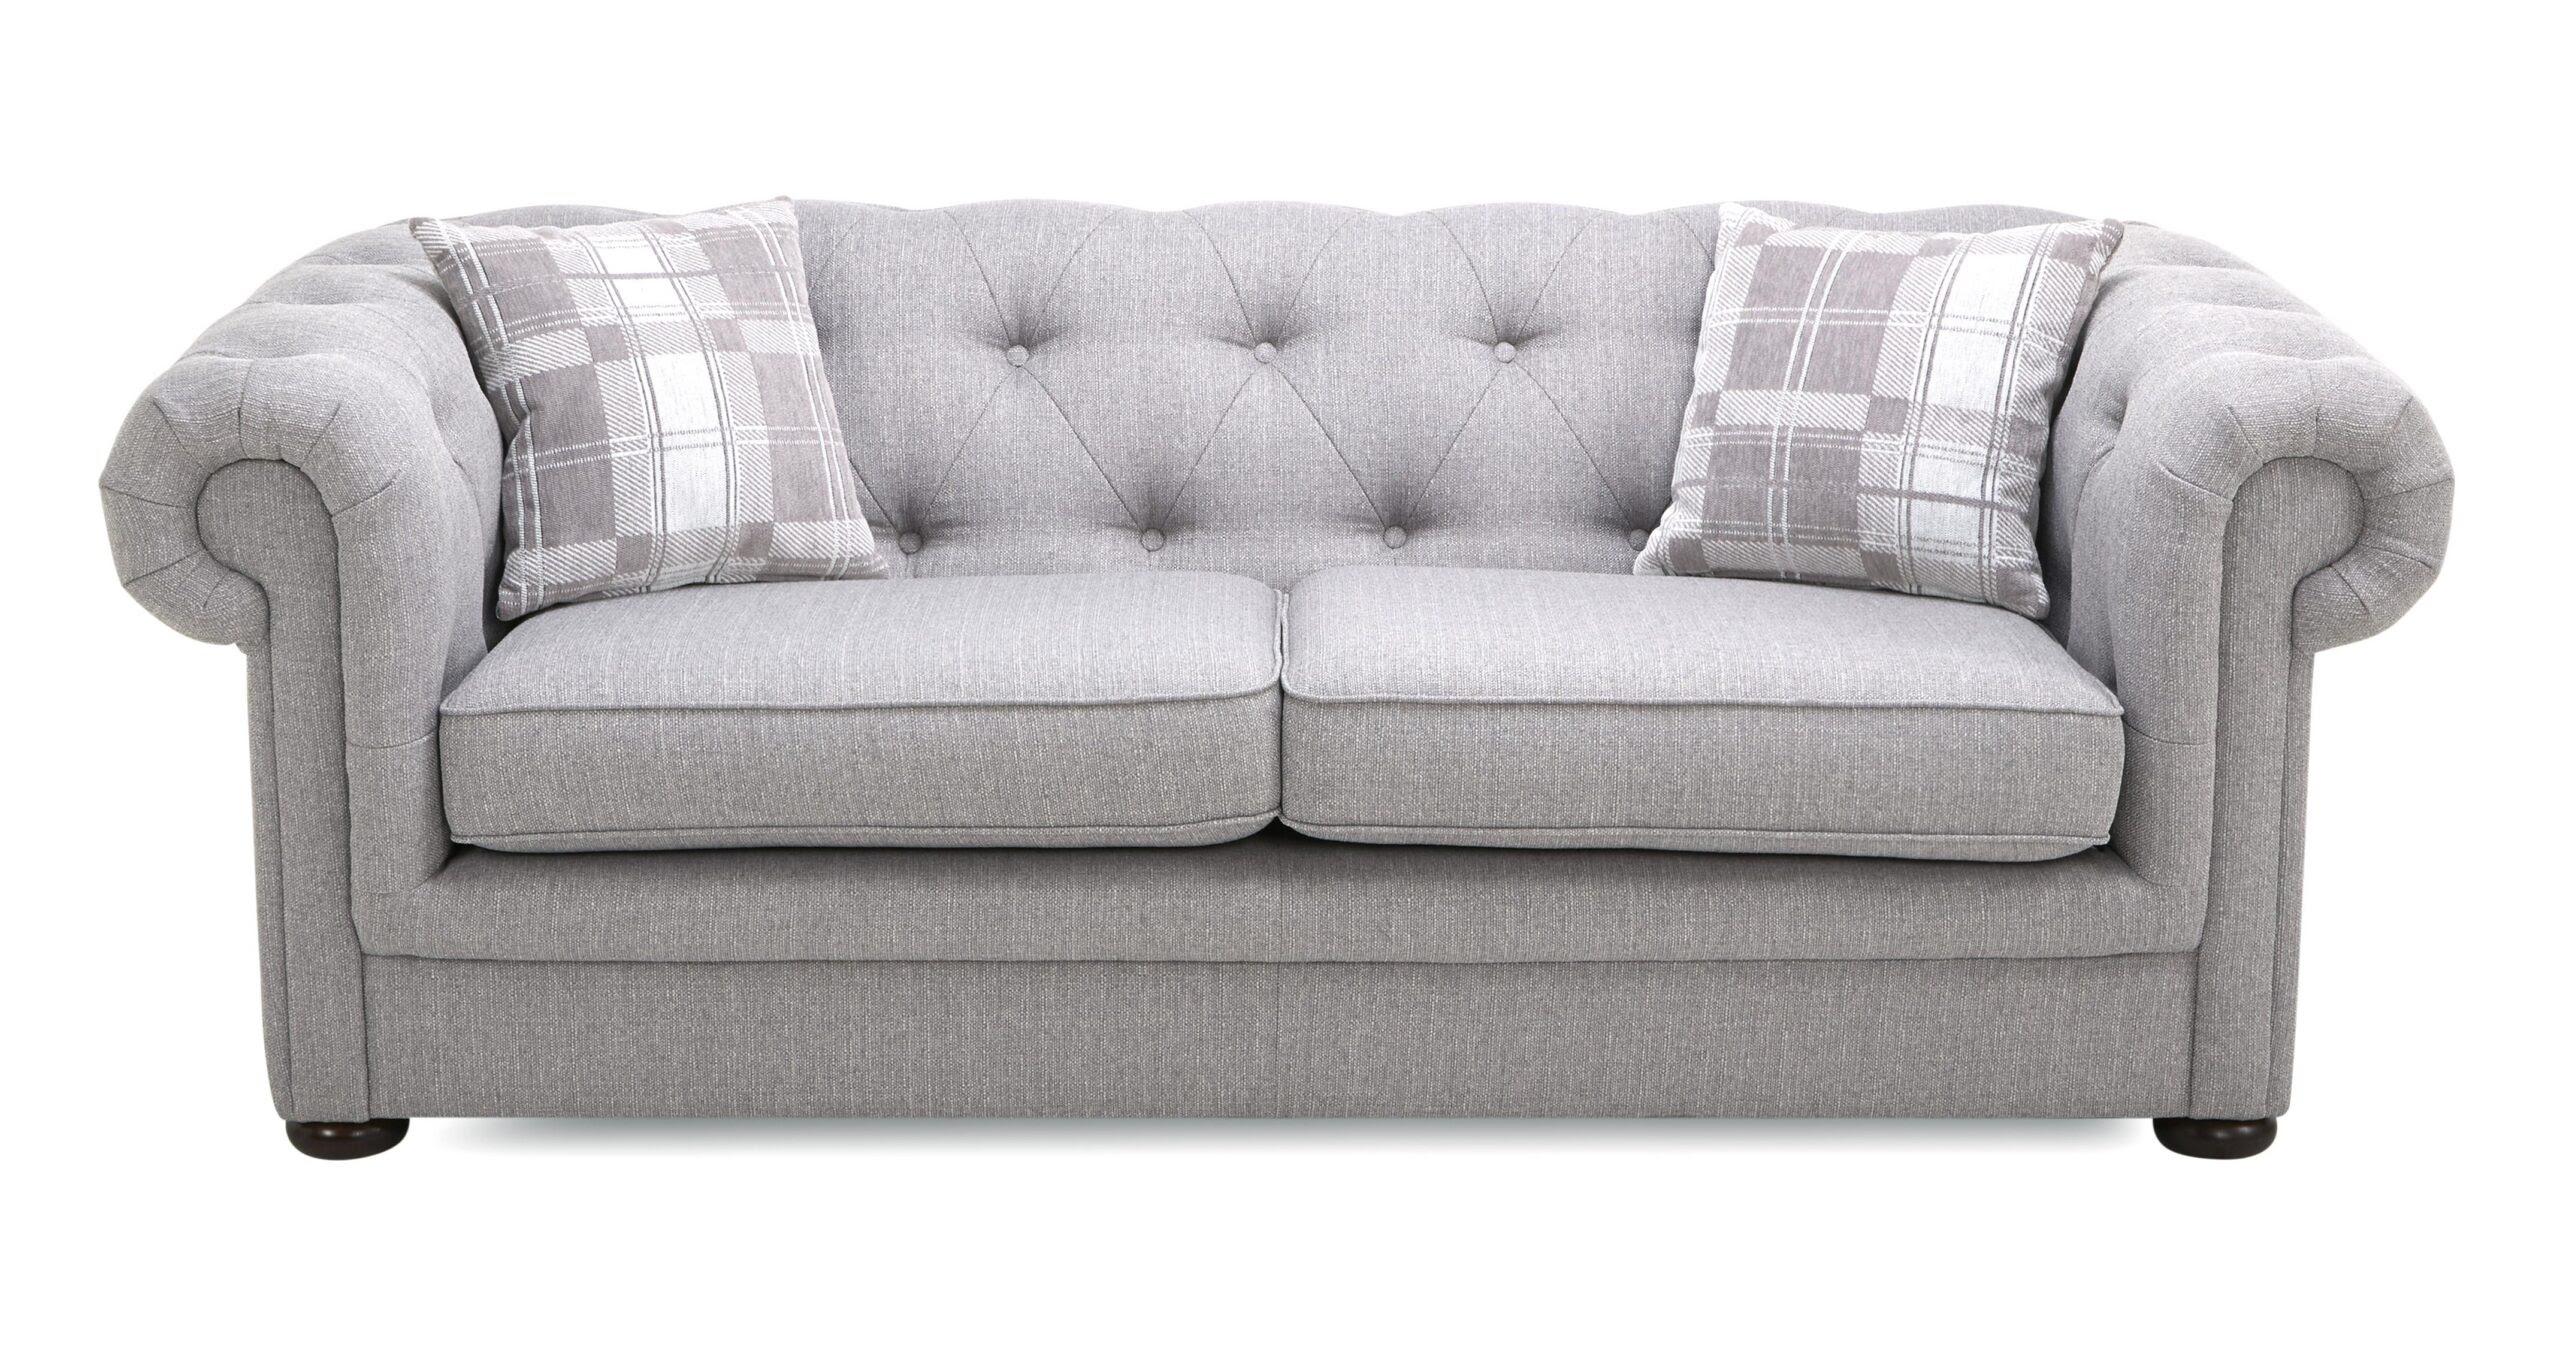 Chesterfield Sofa Samt Grau Set Couch Stoff Otto 2er Graue ...